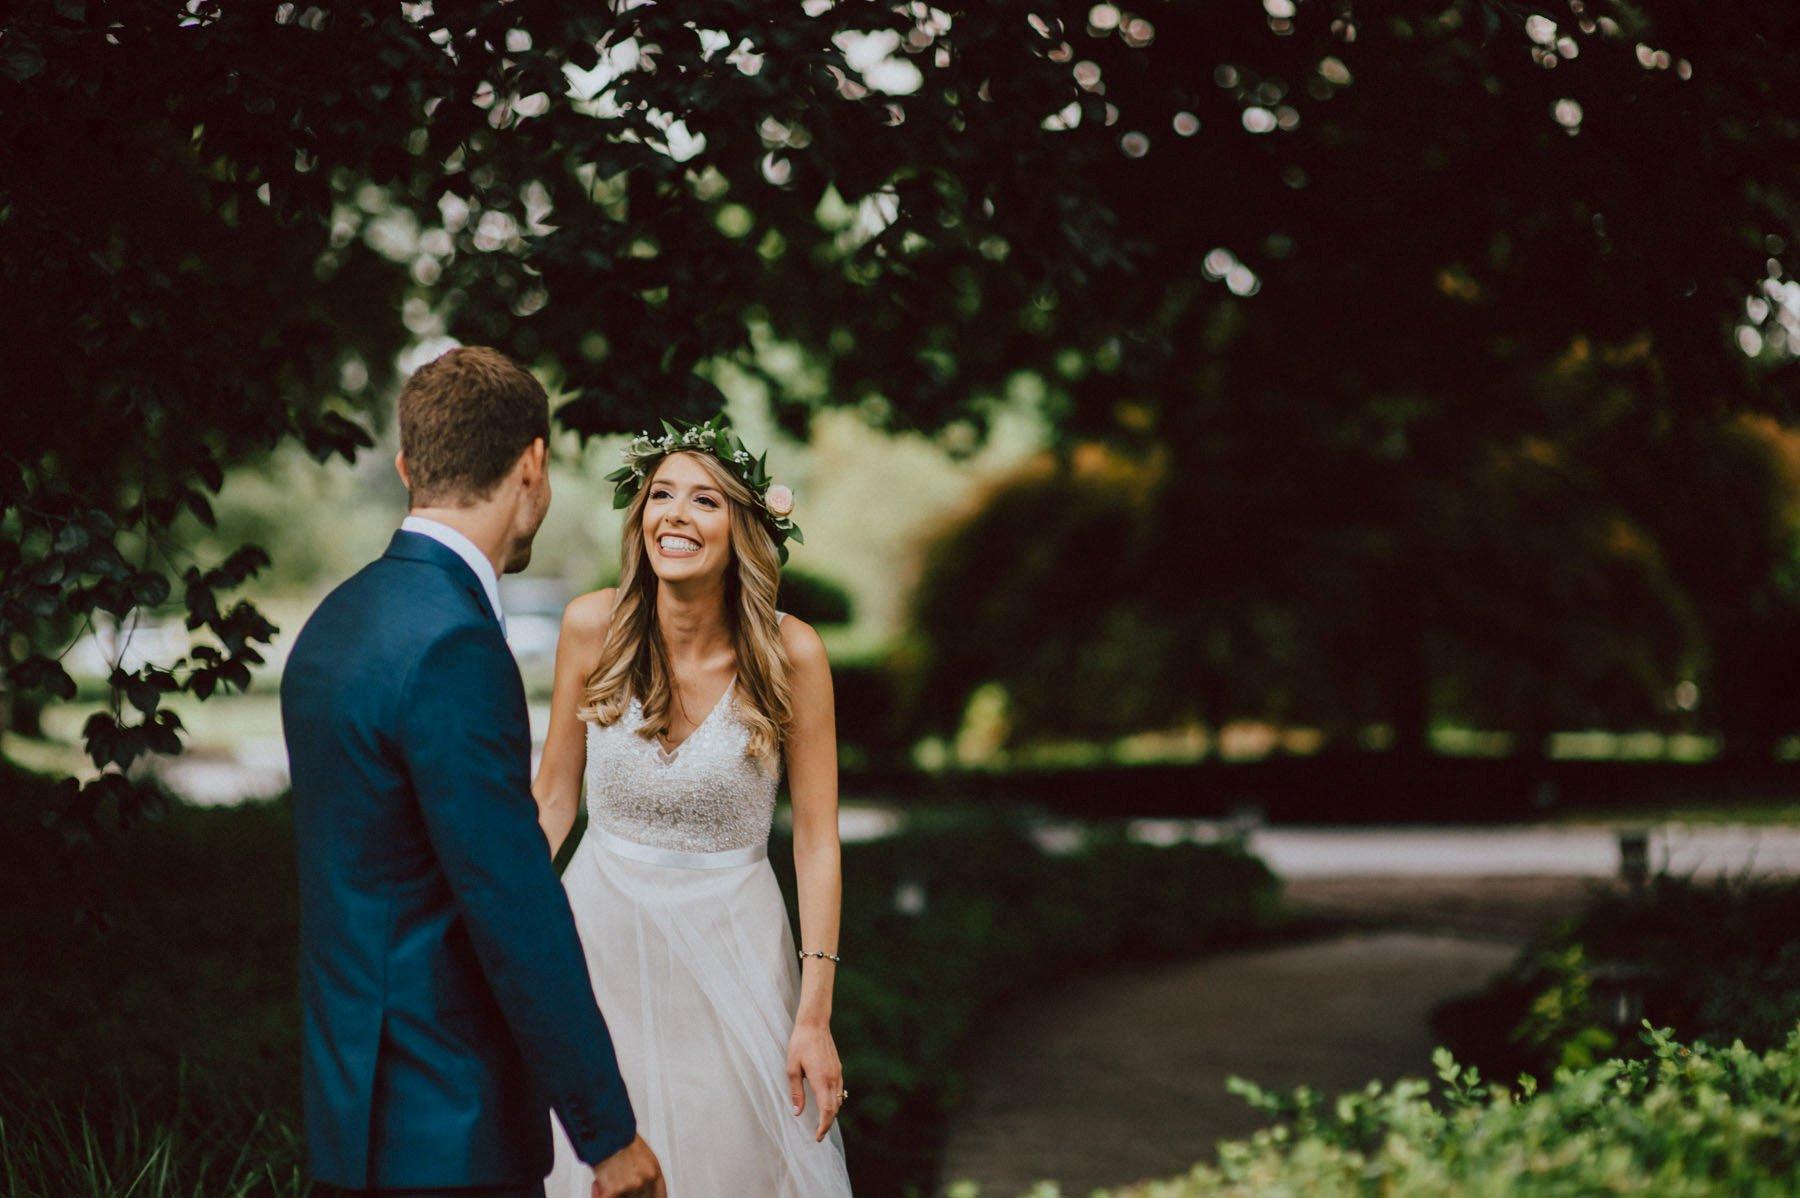 Knowlton-mansion-wedding-50.jpg